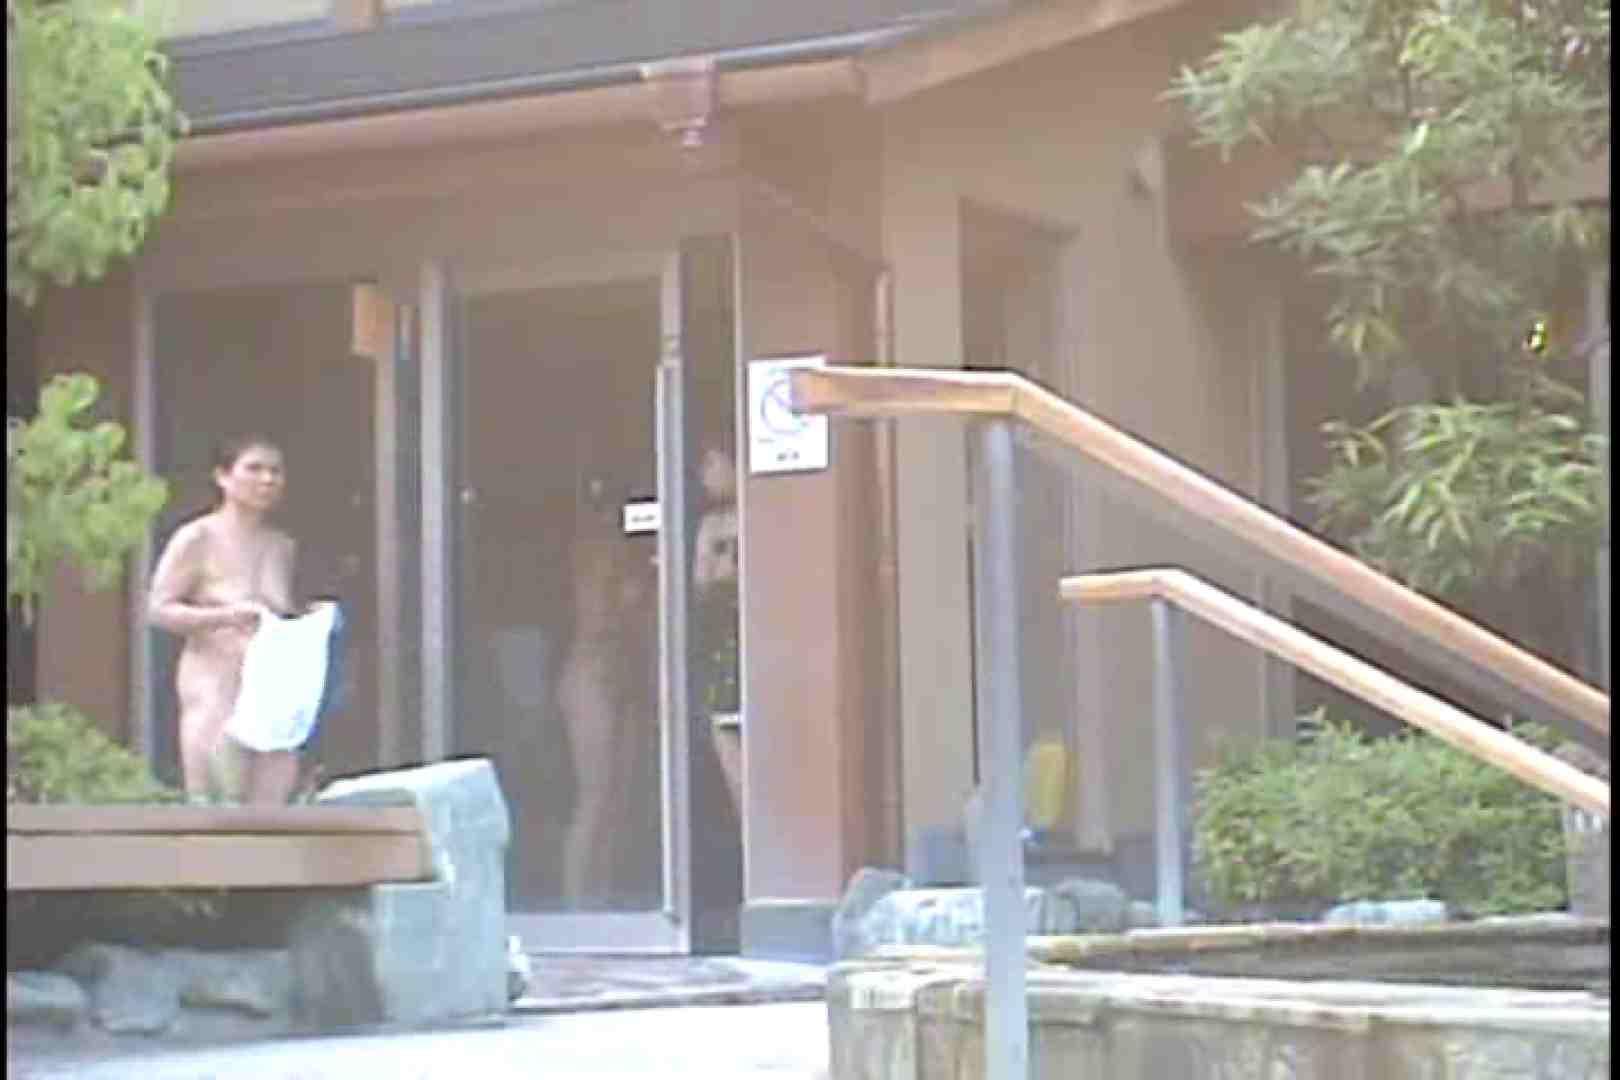 果実の泉 vol.1 美女 オメコ無修正動画無料 100連発 27